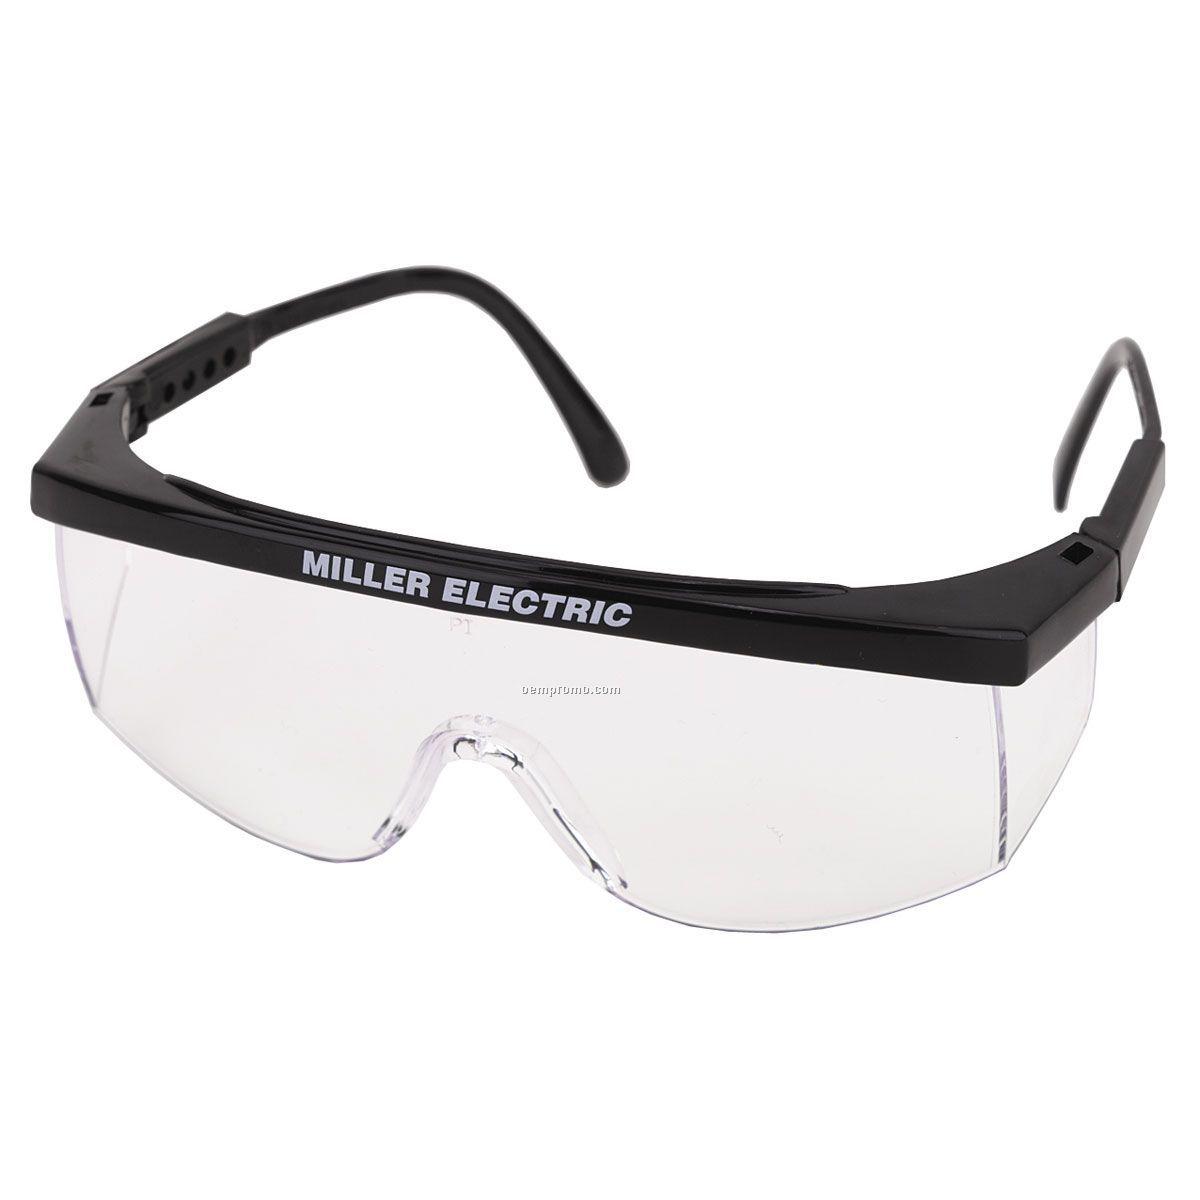 Eyeglass Lens Materials | Trivex | High Index Lenses